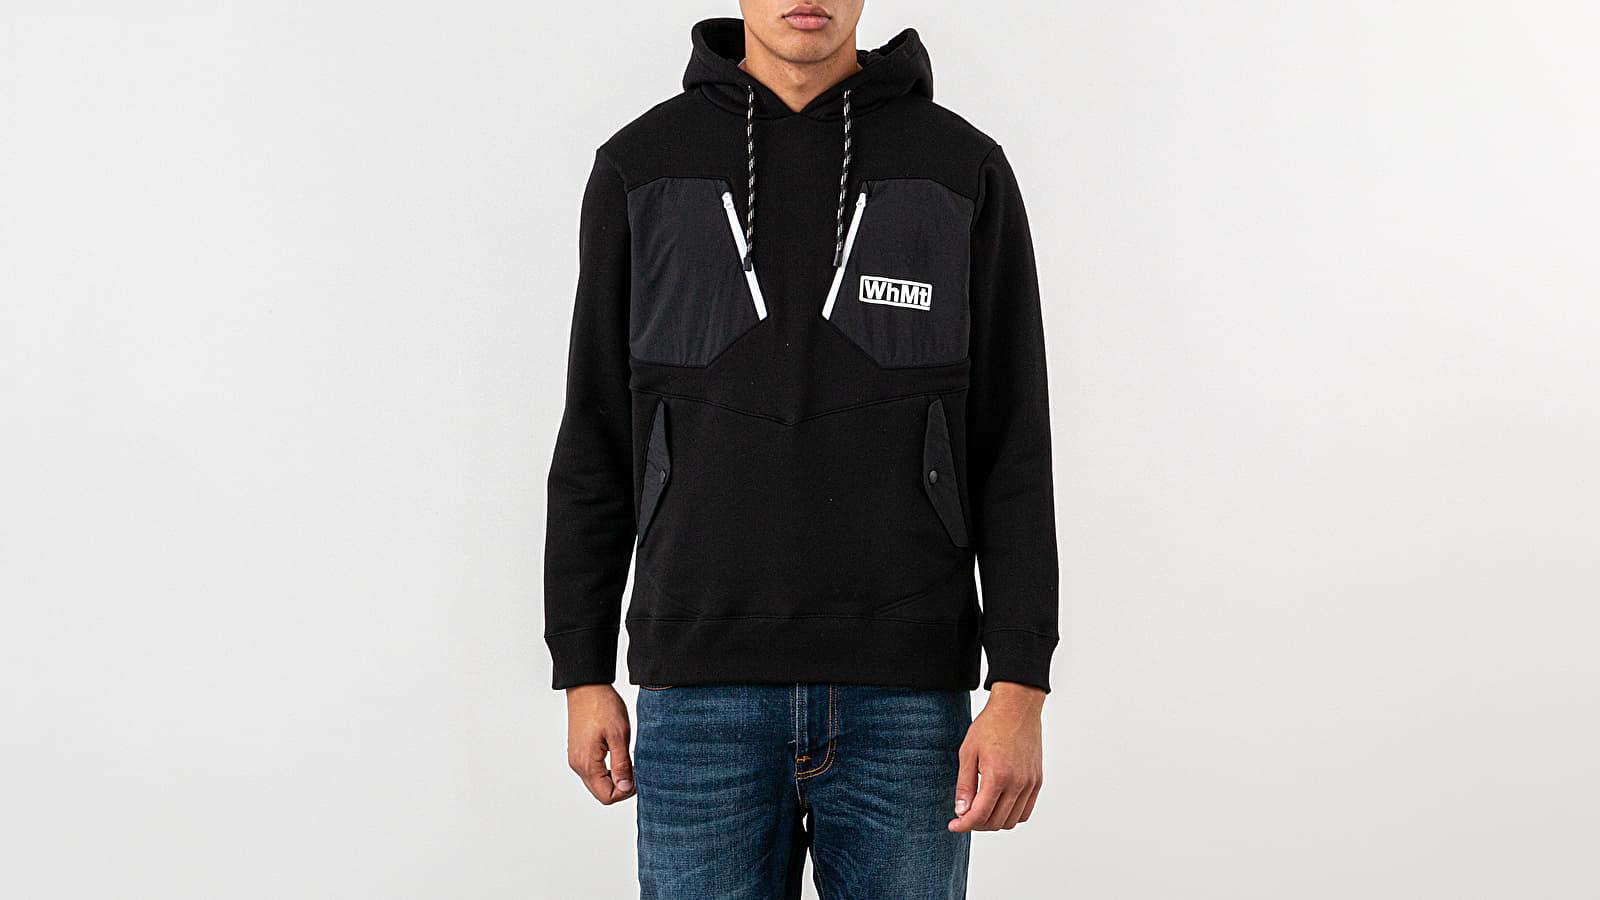 Sweatshirts White Mountaineering Hoodie Black